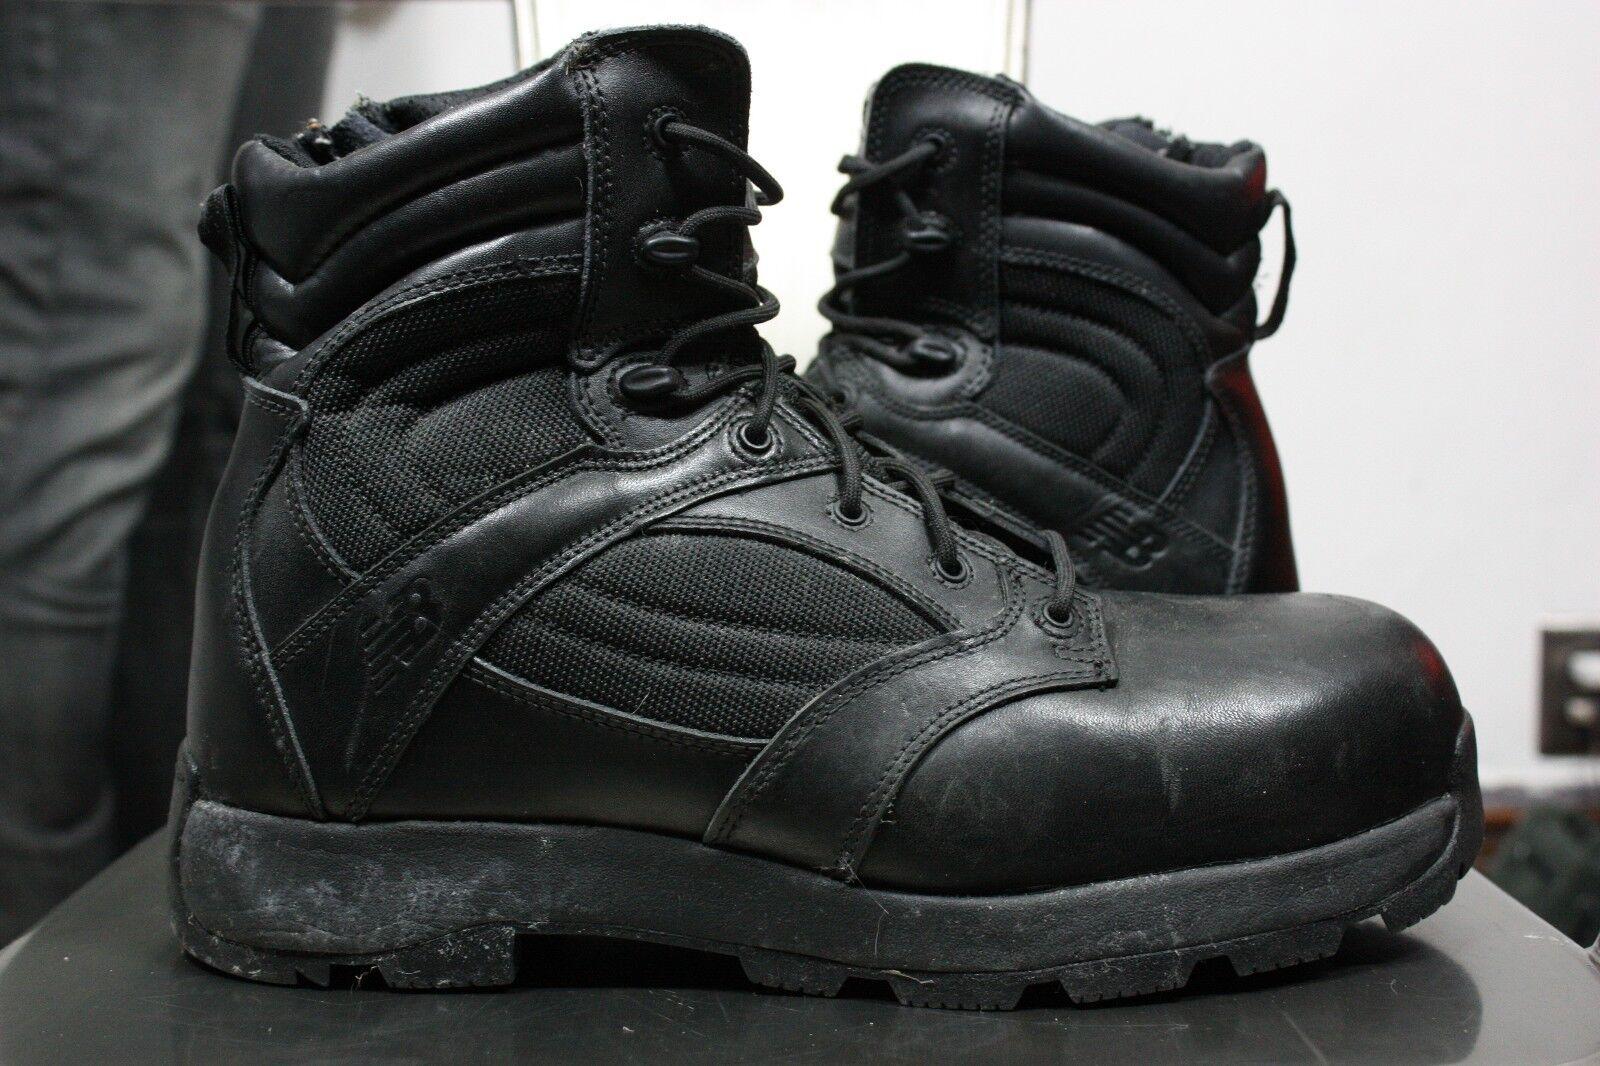 New Balance OTB boots 11.5 971 leather tactial combat military steel toe black